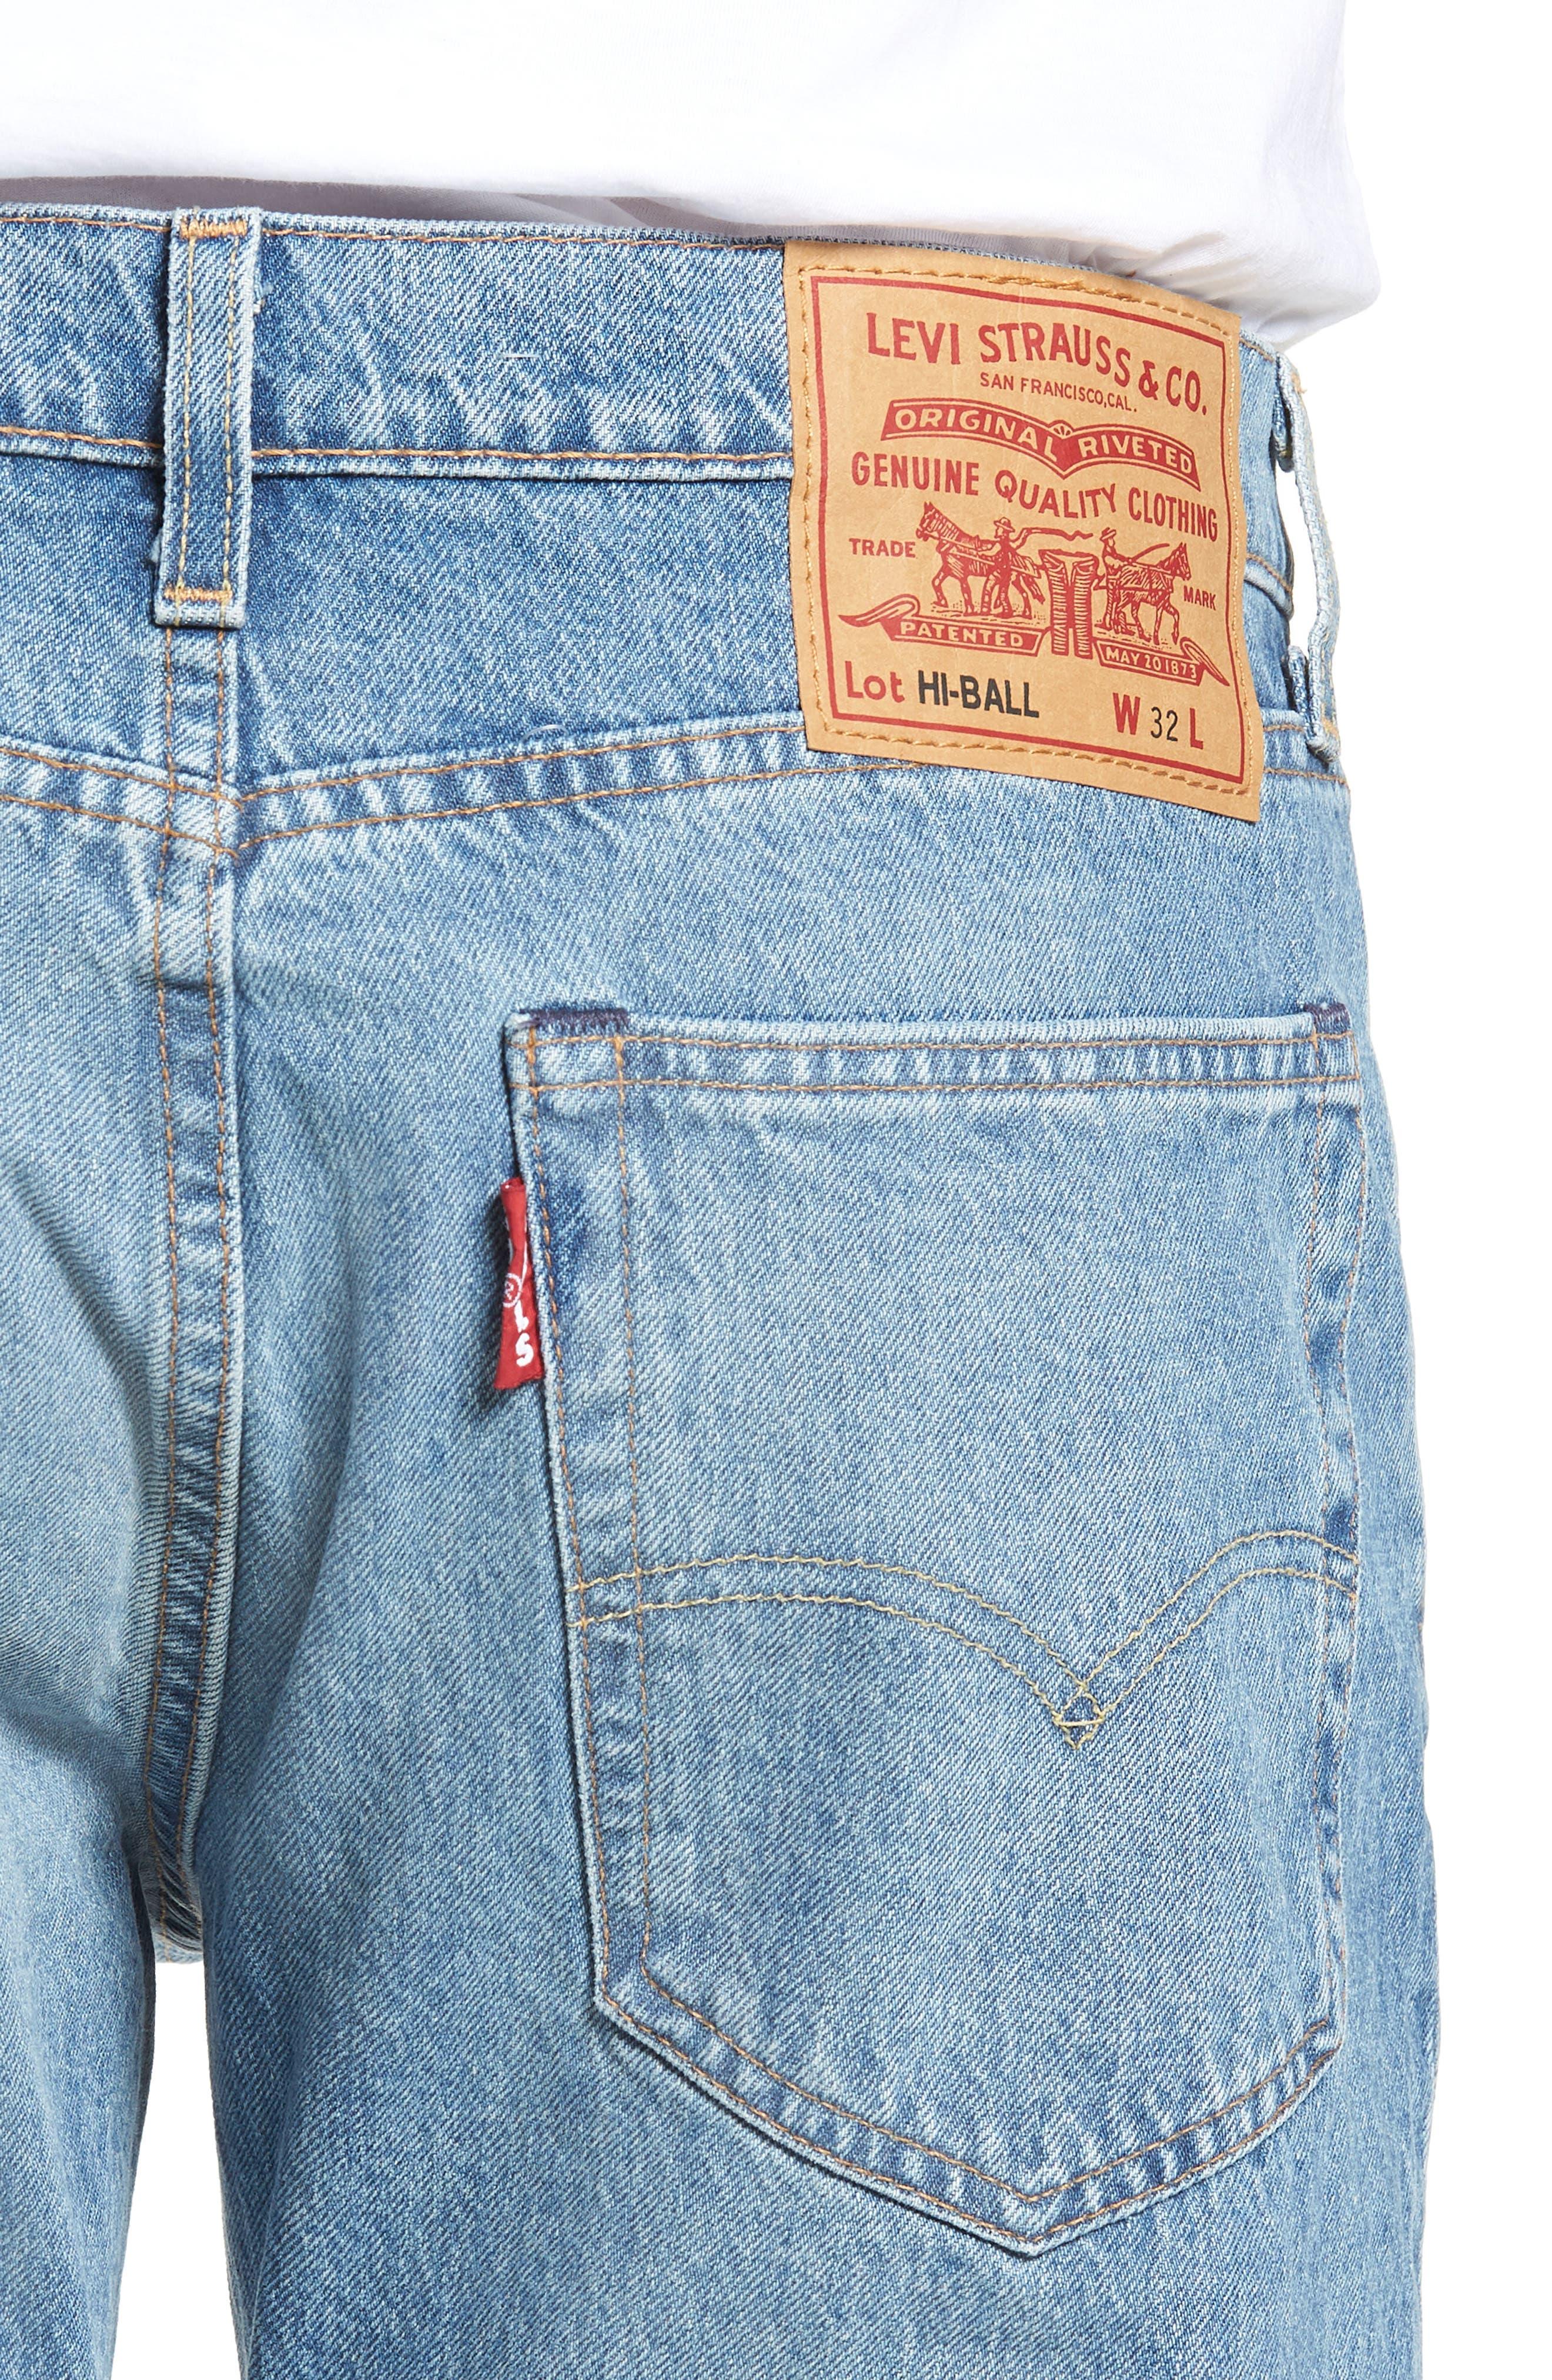 Hi-Ball Straight Leg Jeans,                             Alternate thumbnail 4, color,                             LIGHT BLUE